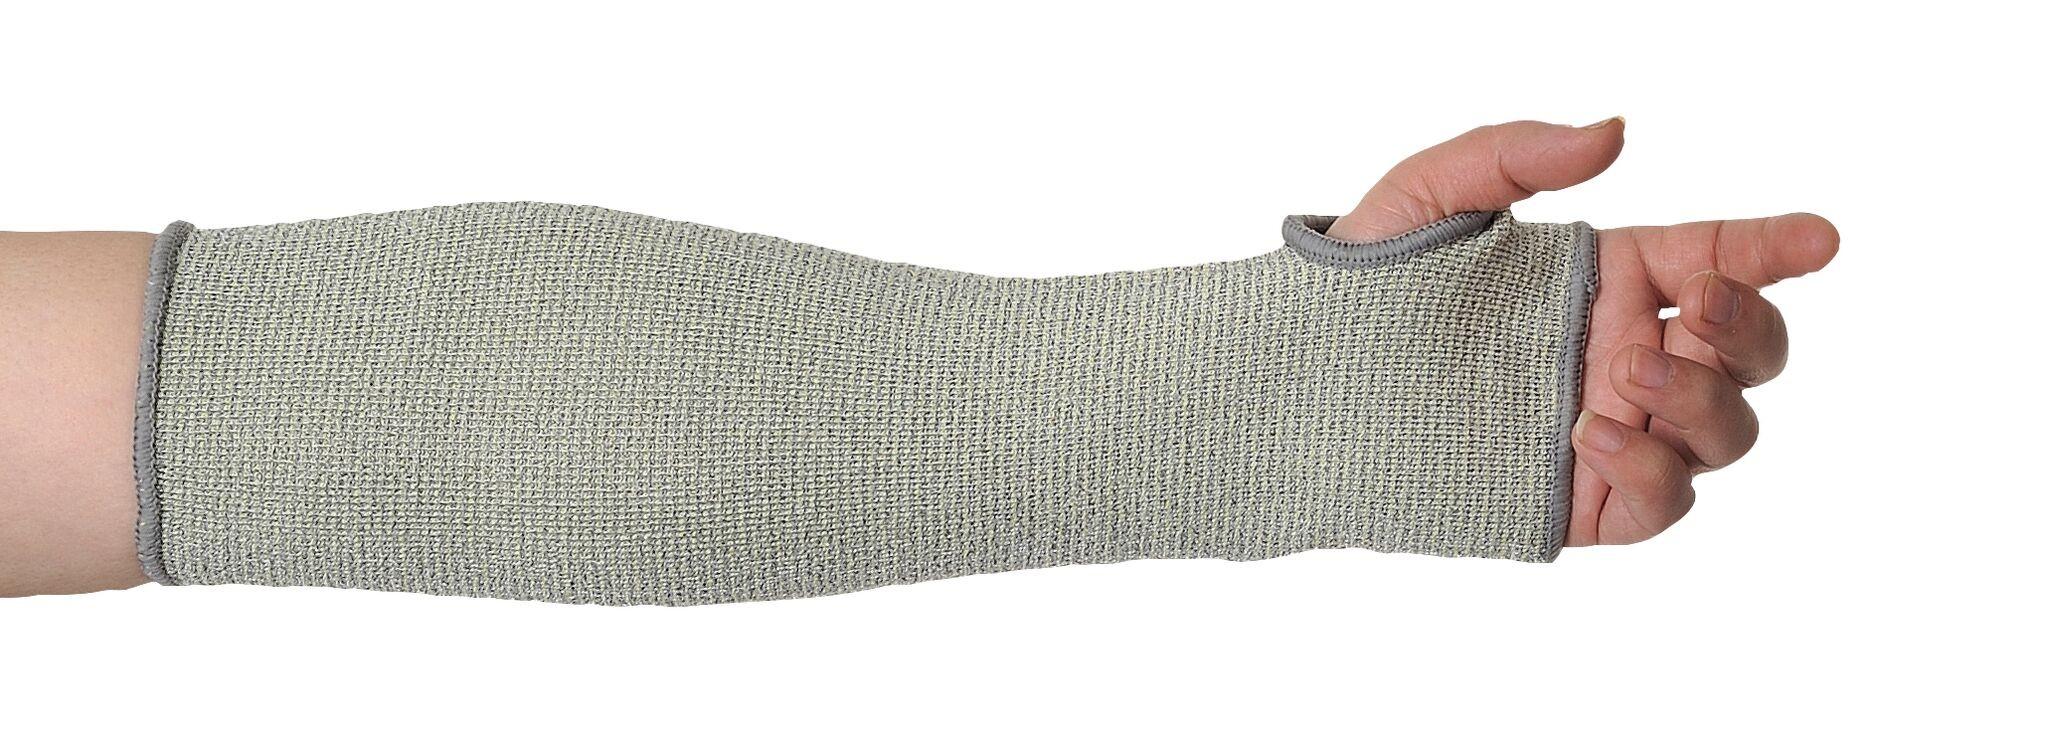 "Portwest 14"" Cut Resistant Sleeve"